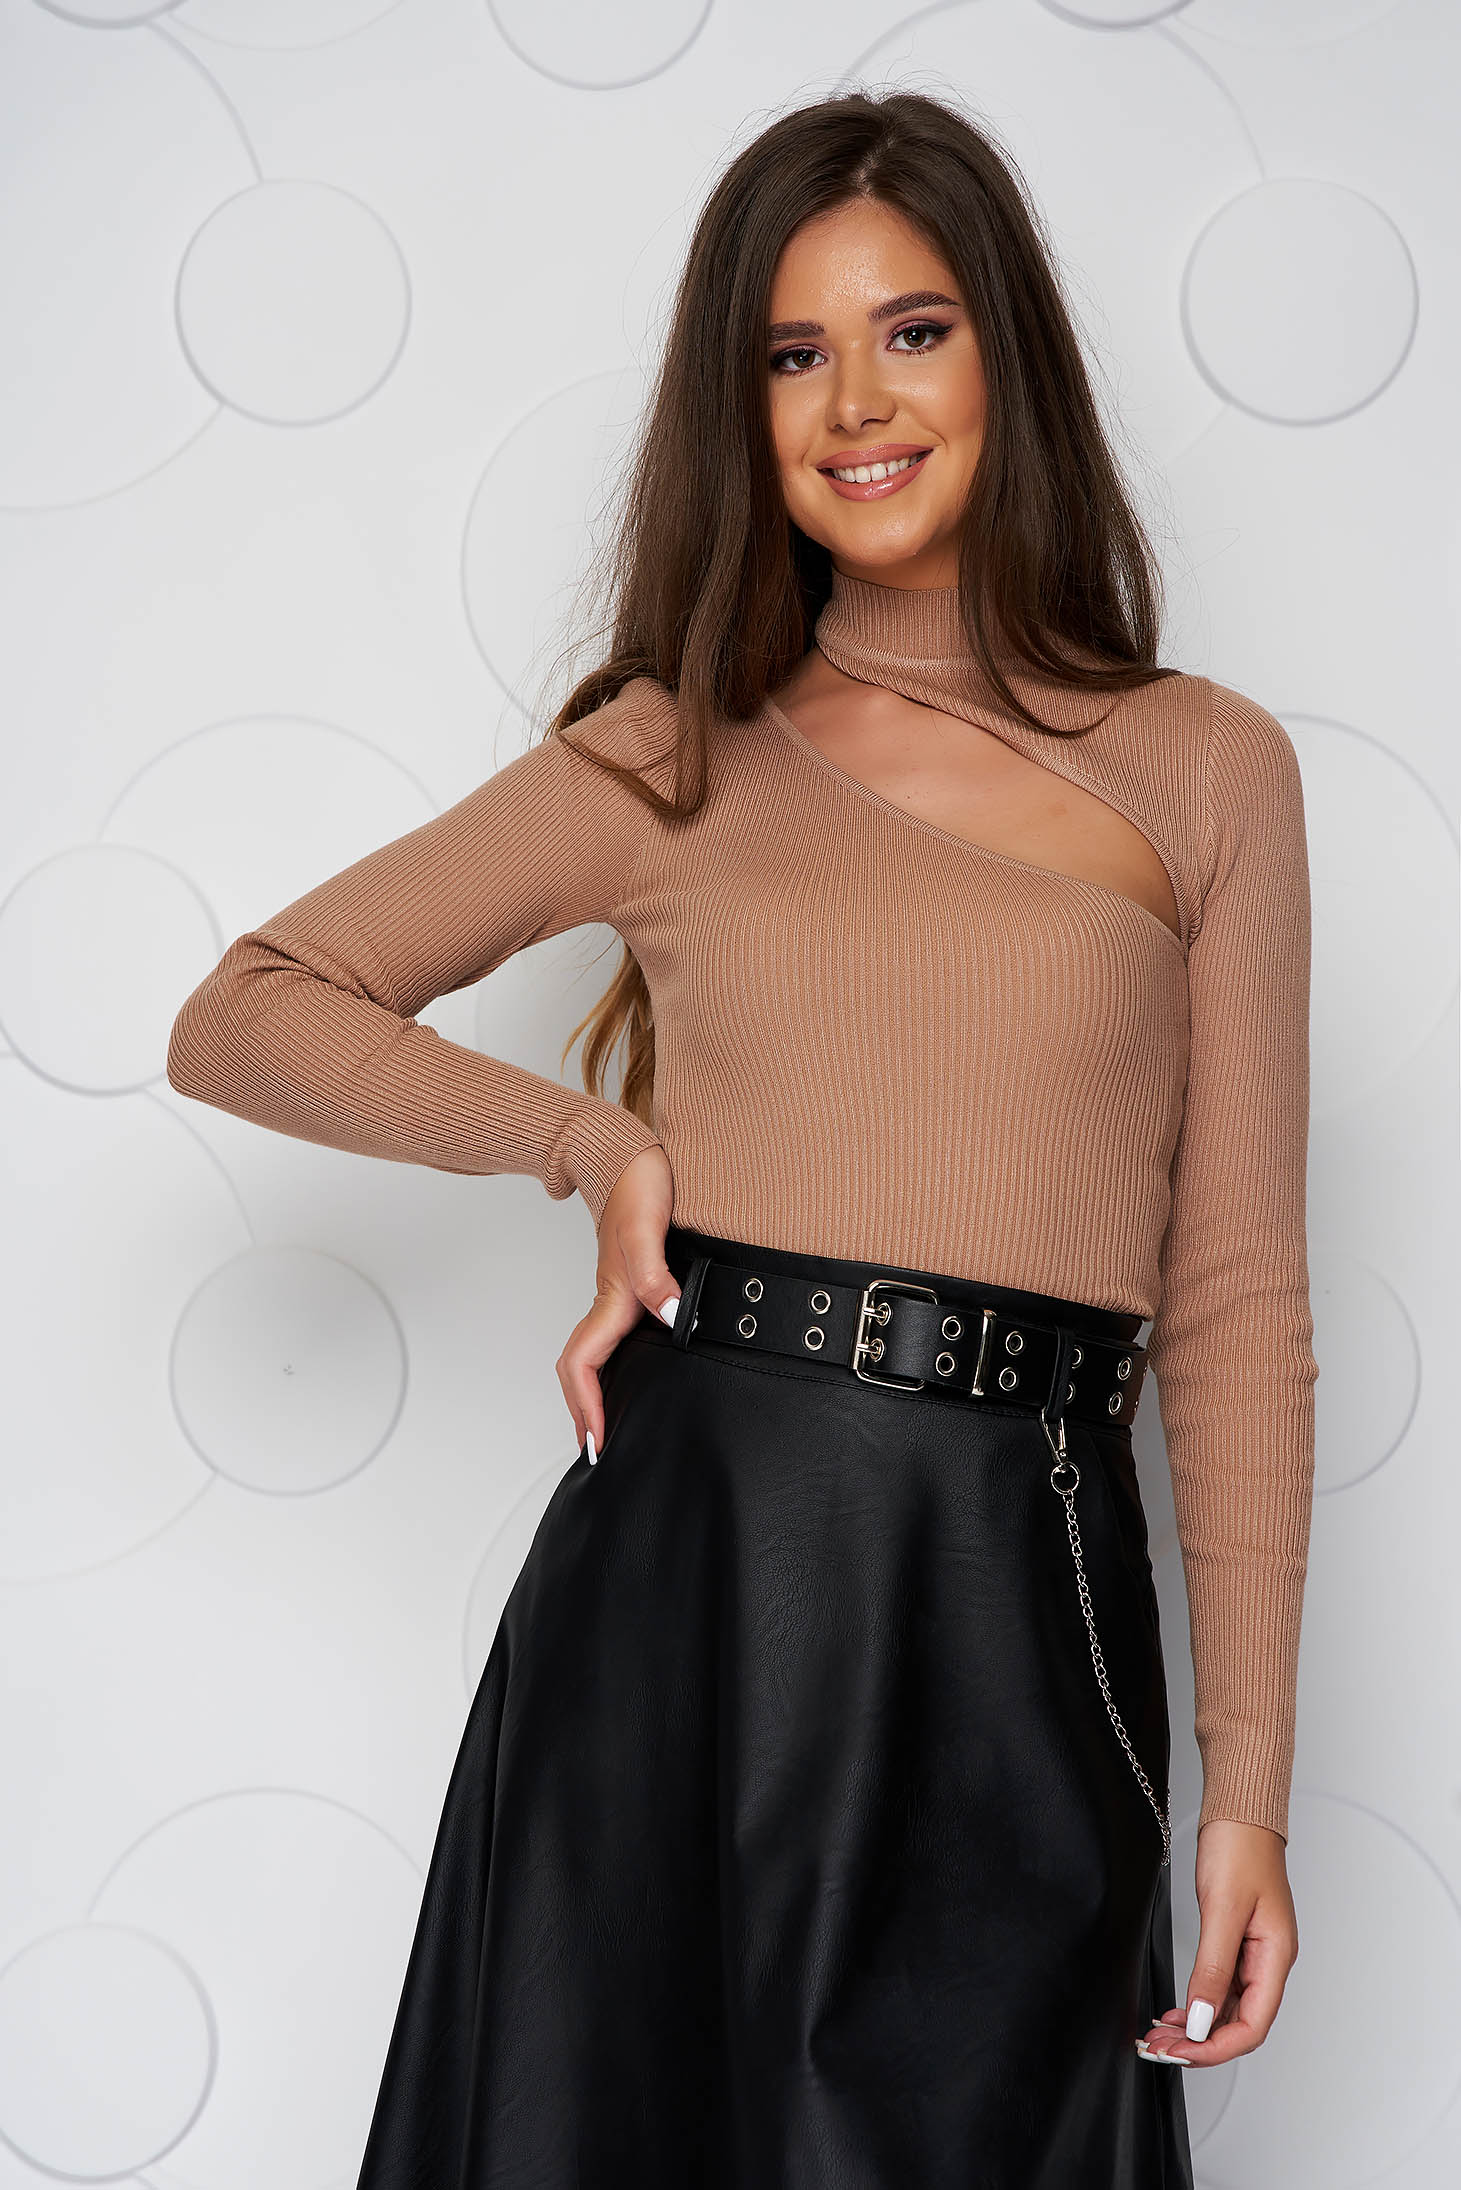 Bluza dama SunShine maro scurta mulata din material tricotat reiat si decupata la bust